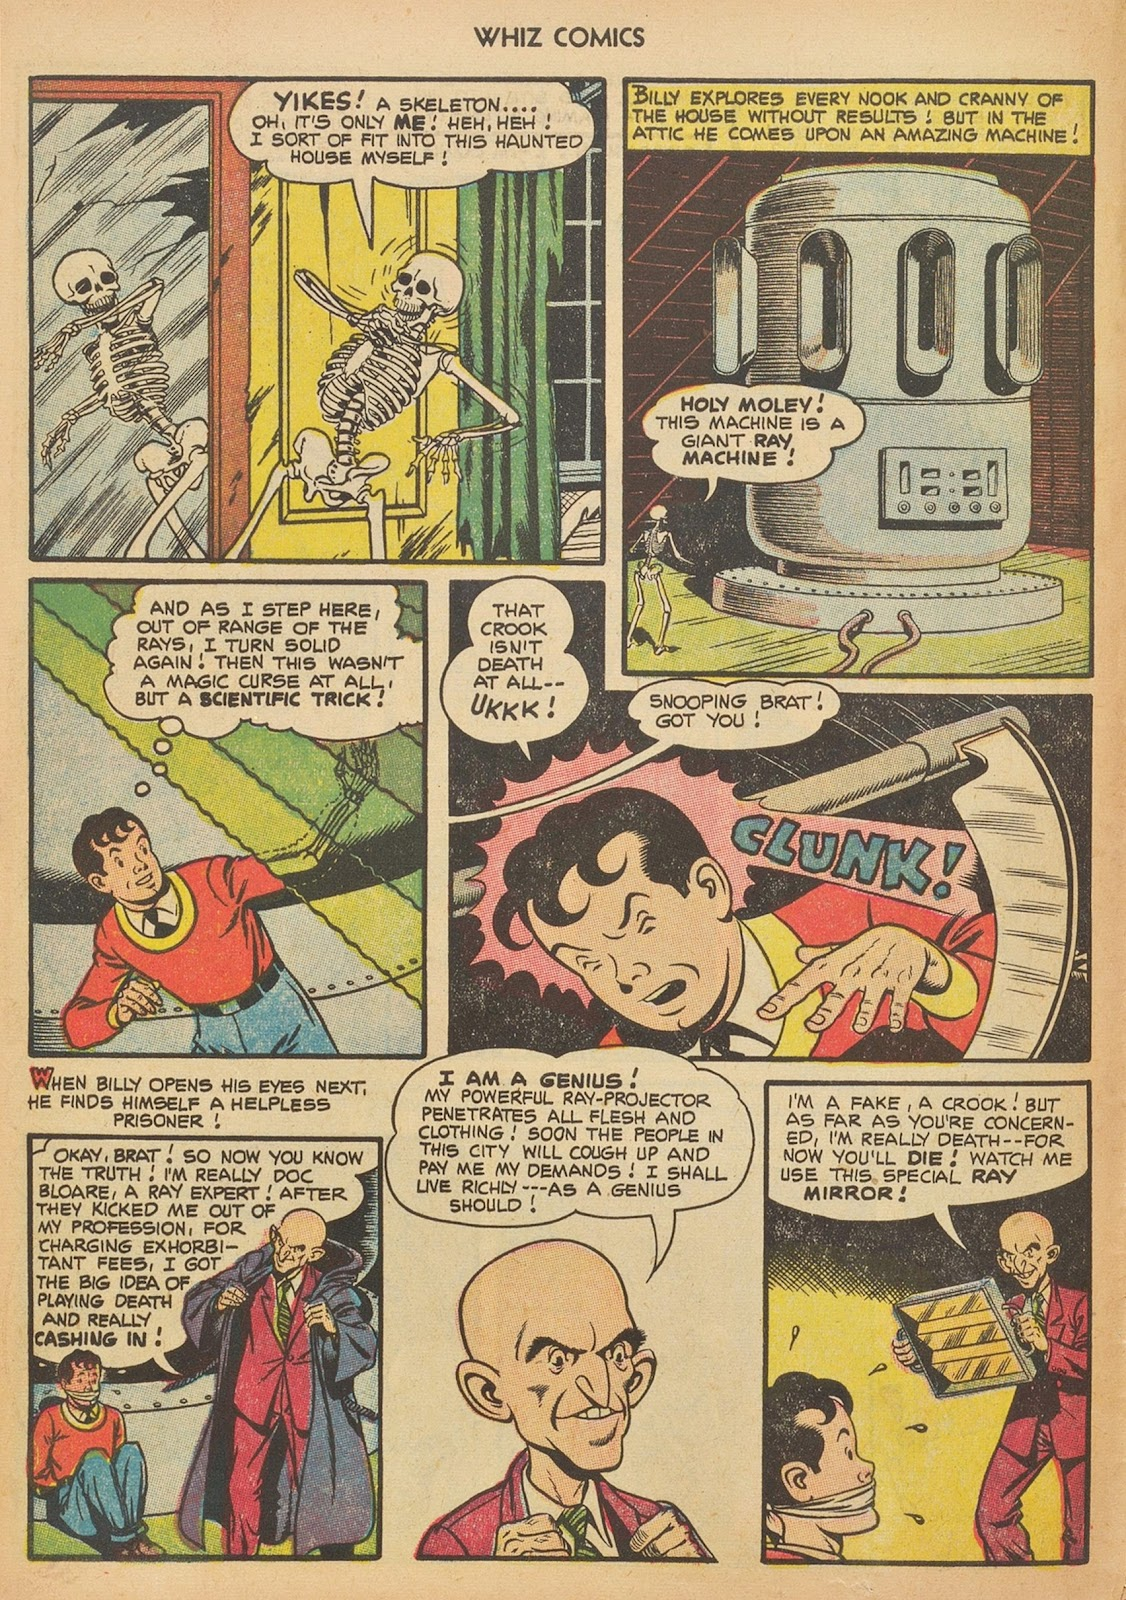 Read online WHIZ Comics comic -  Issue #153 - 8